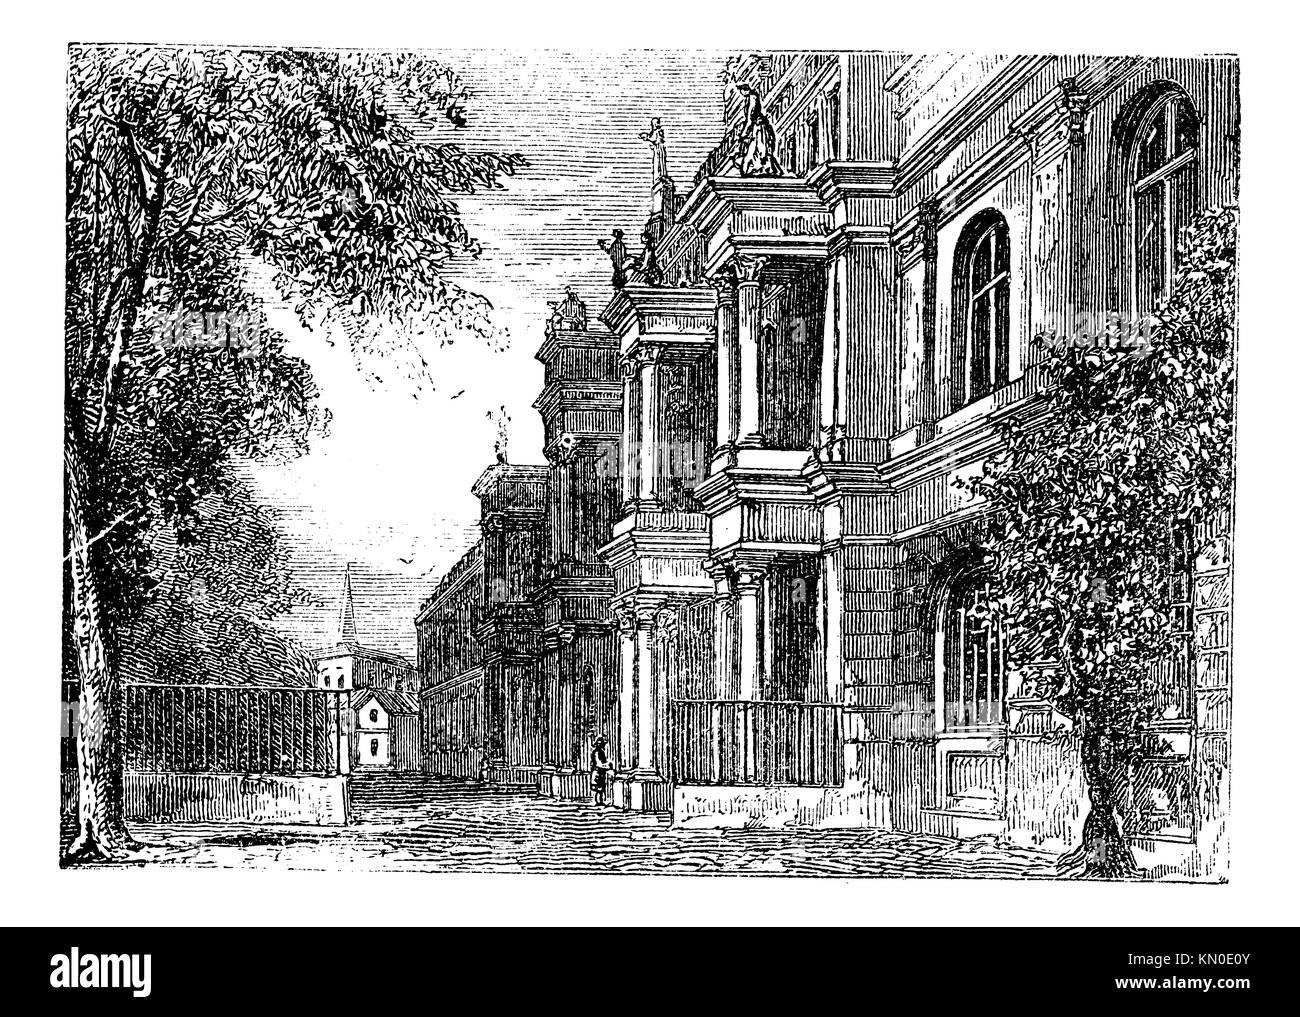 University of Bonn, Bonn, Germany vintage engraving  Old engraved illustration of University of Bonn, Germany, 1890s - Stock Image